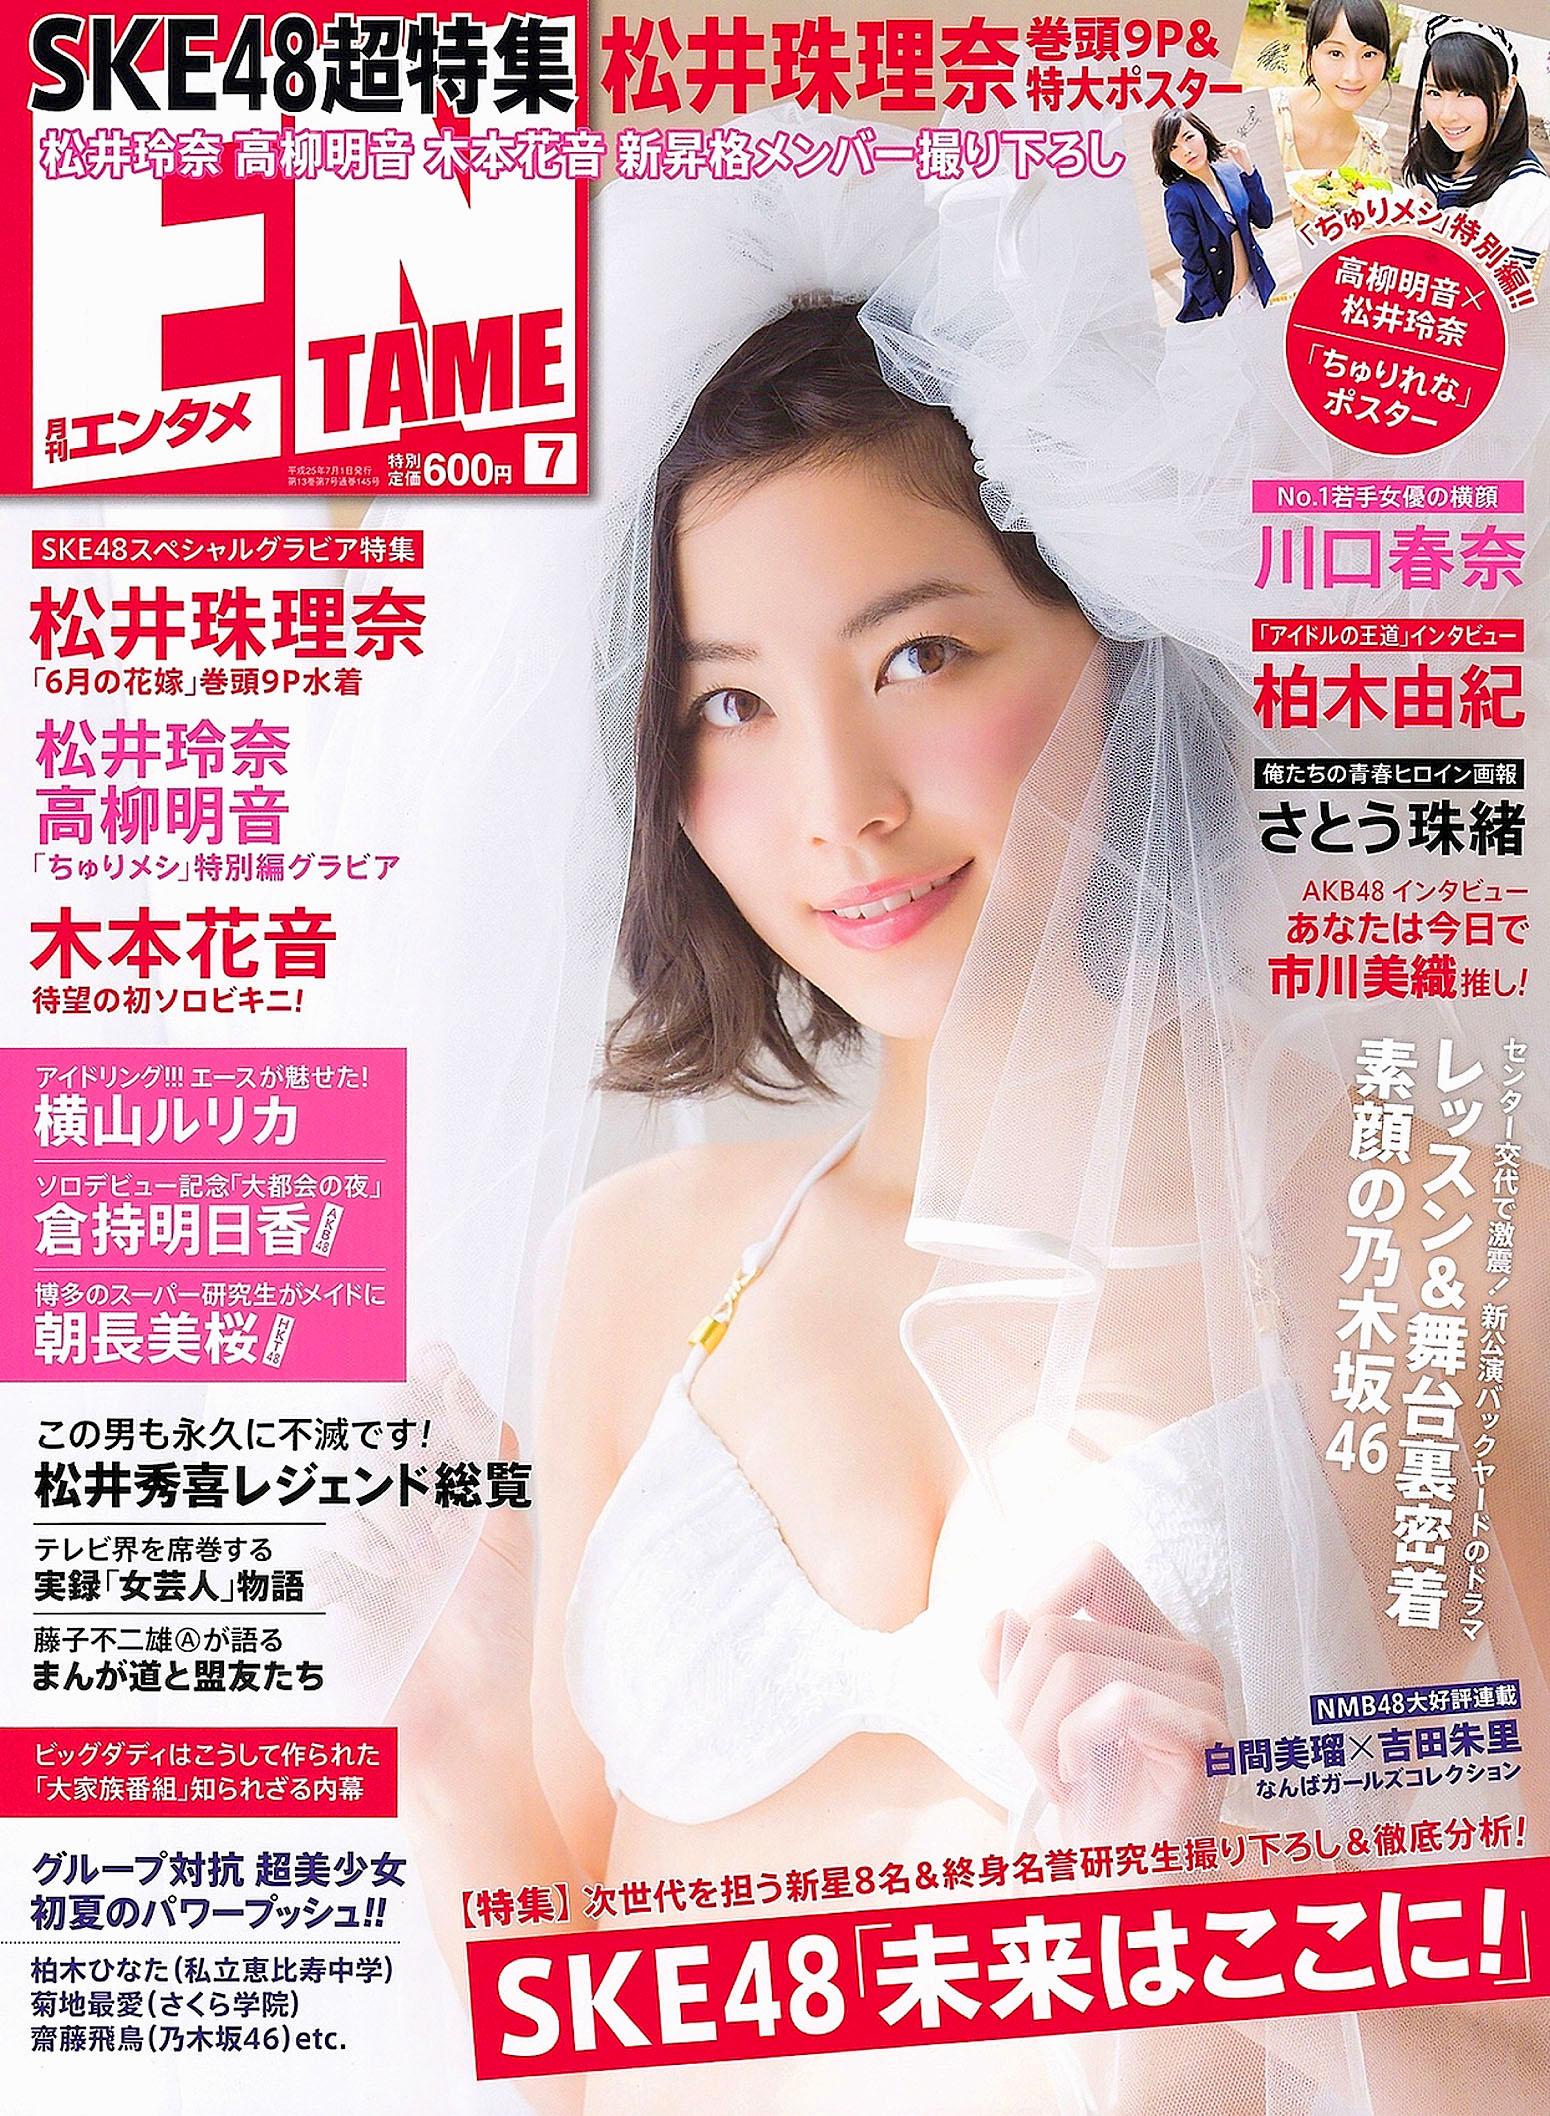 MJurina EnTame 1307 01.jpg